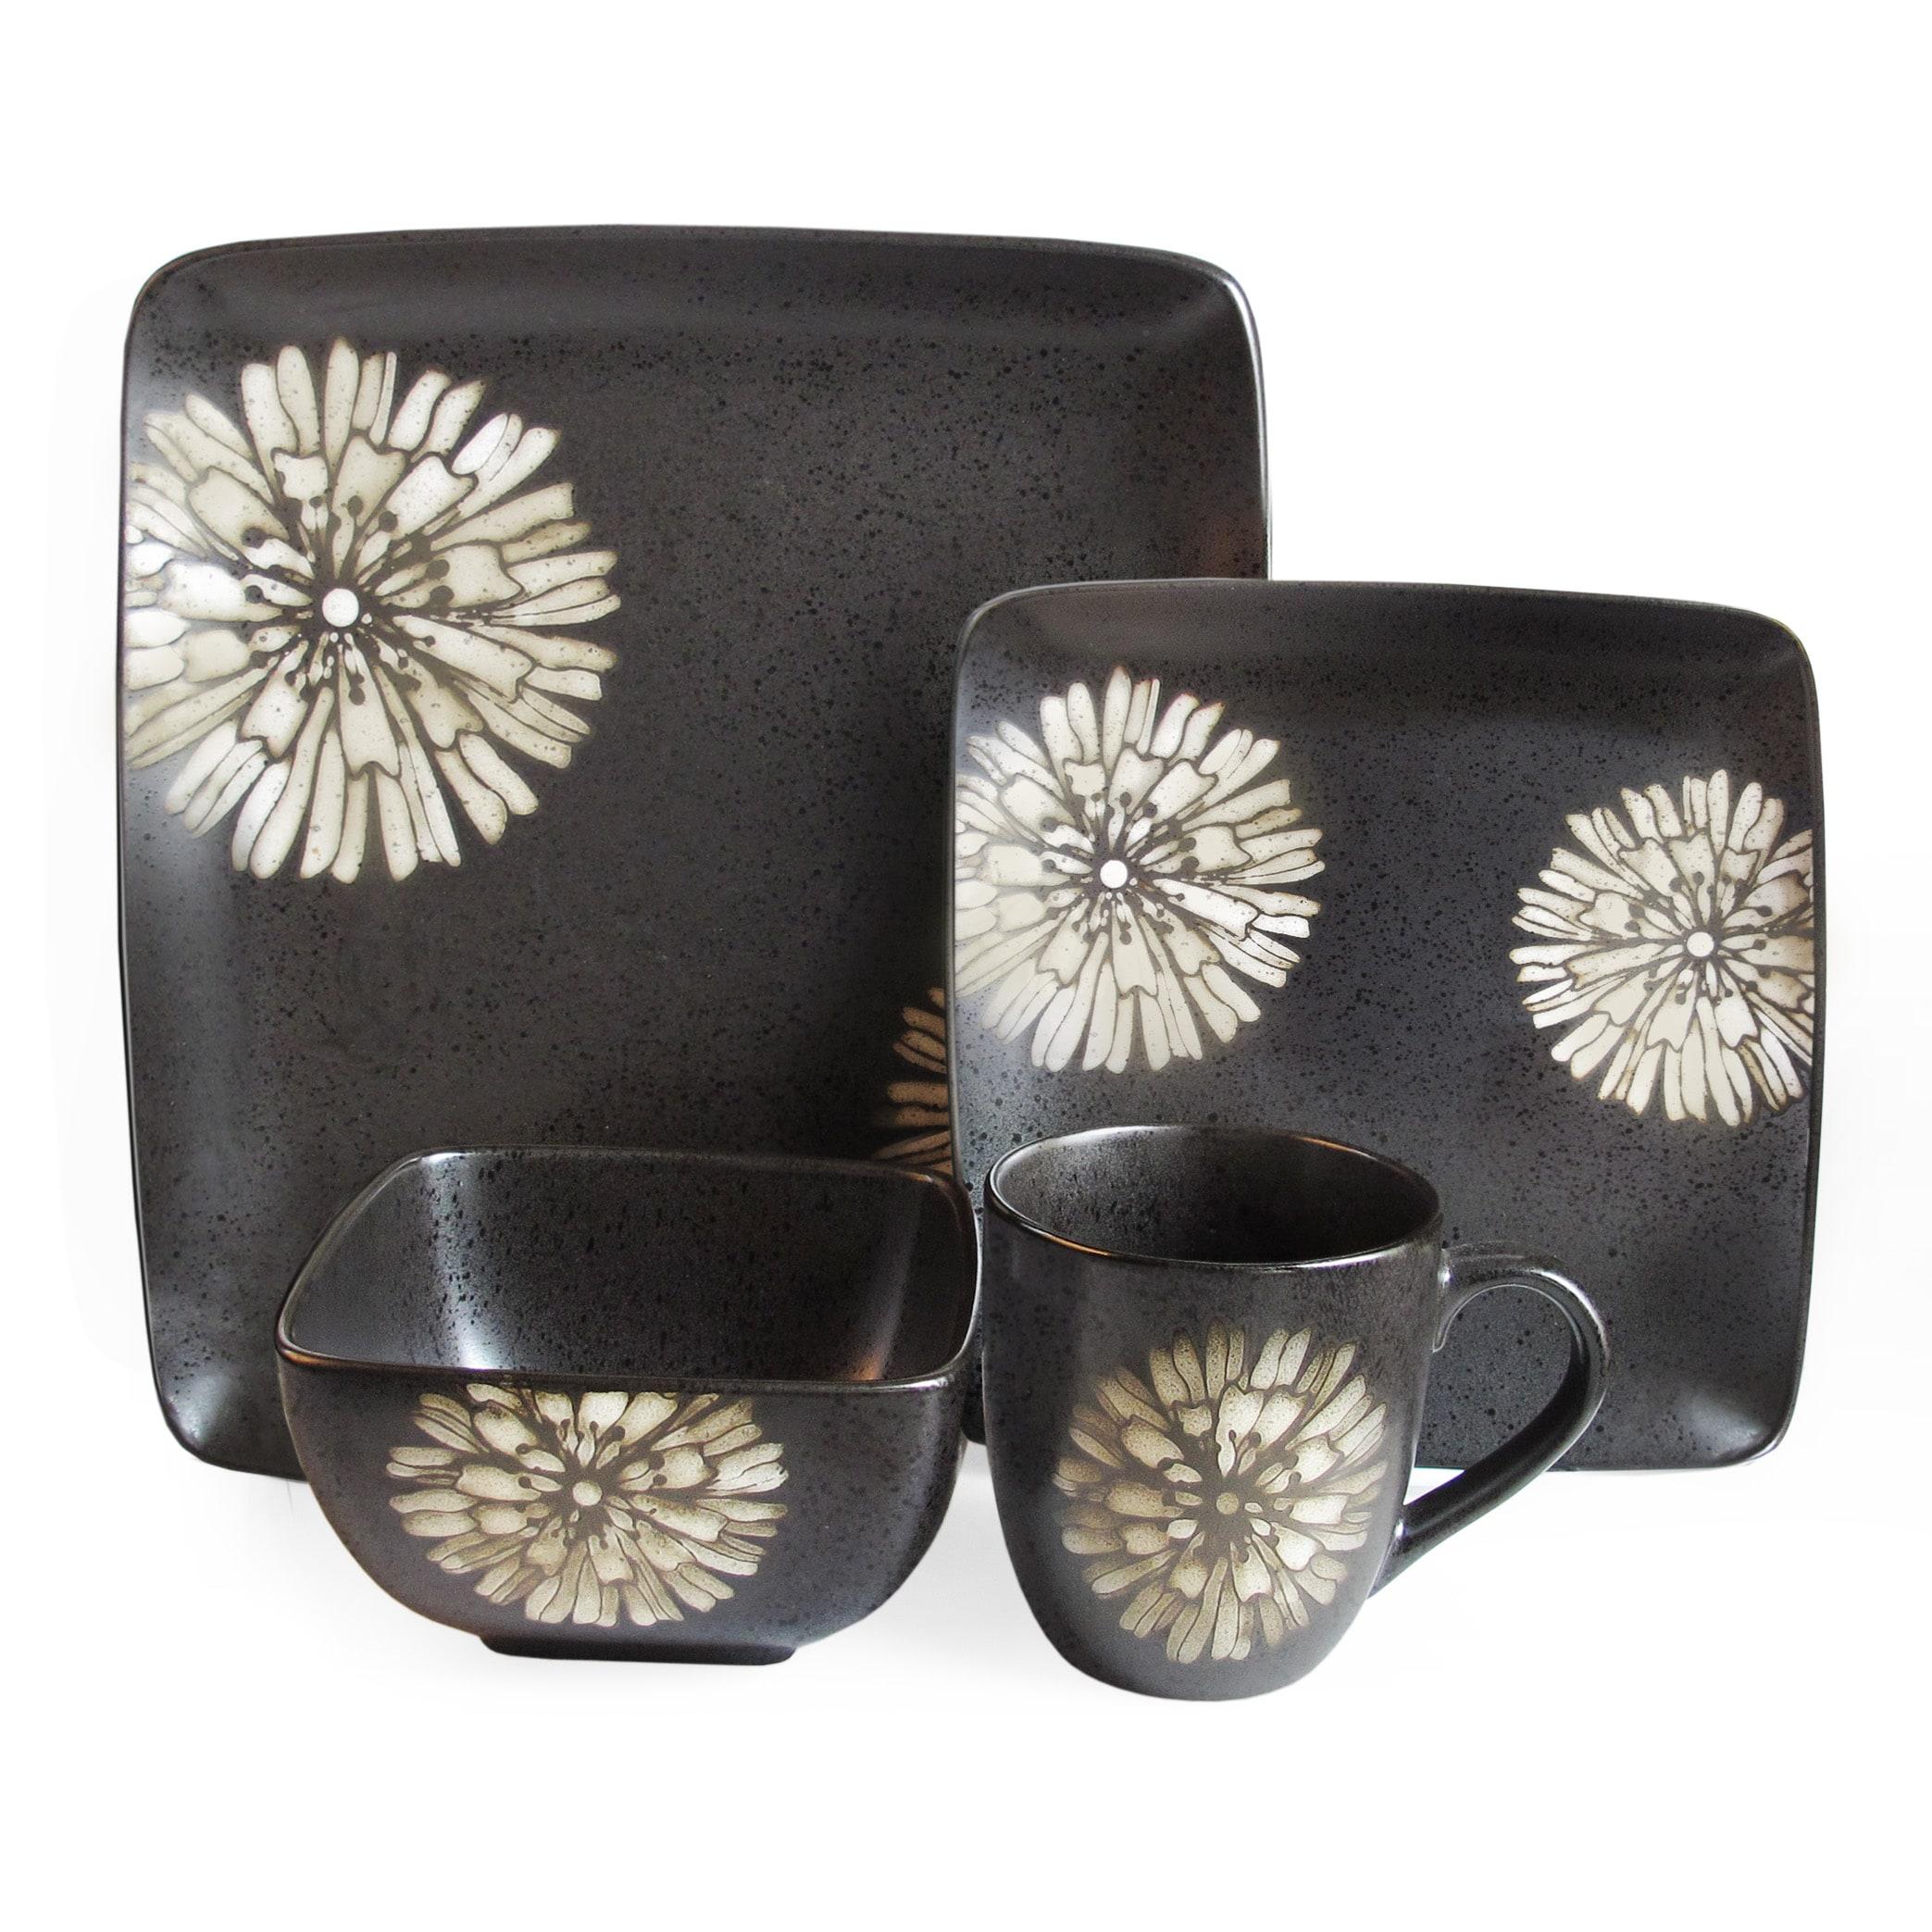 American Atelier Camile White 16-piece Dinnerware Set